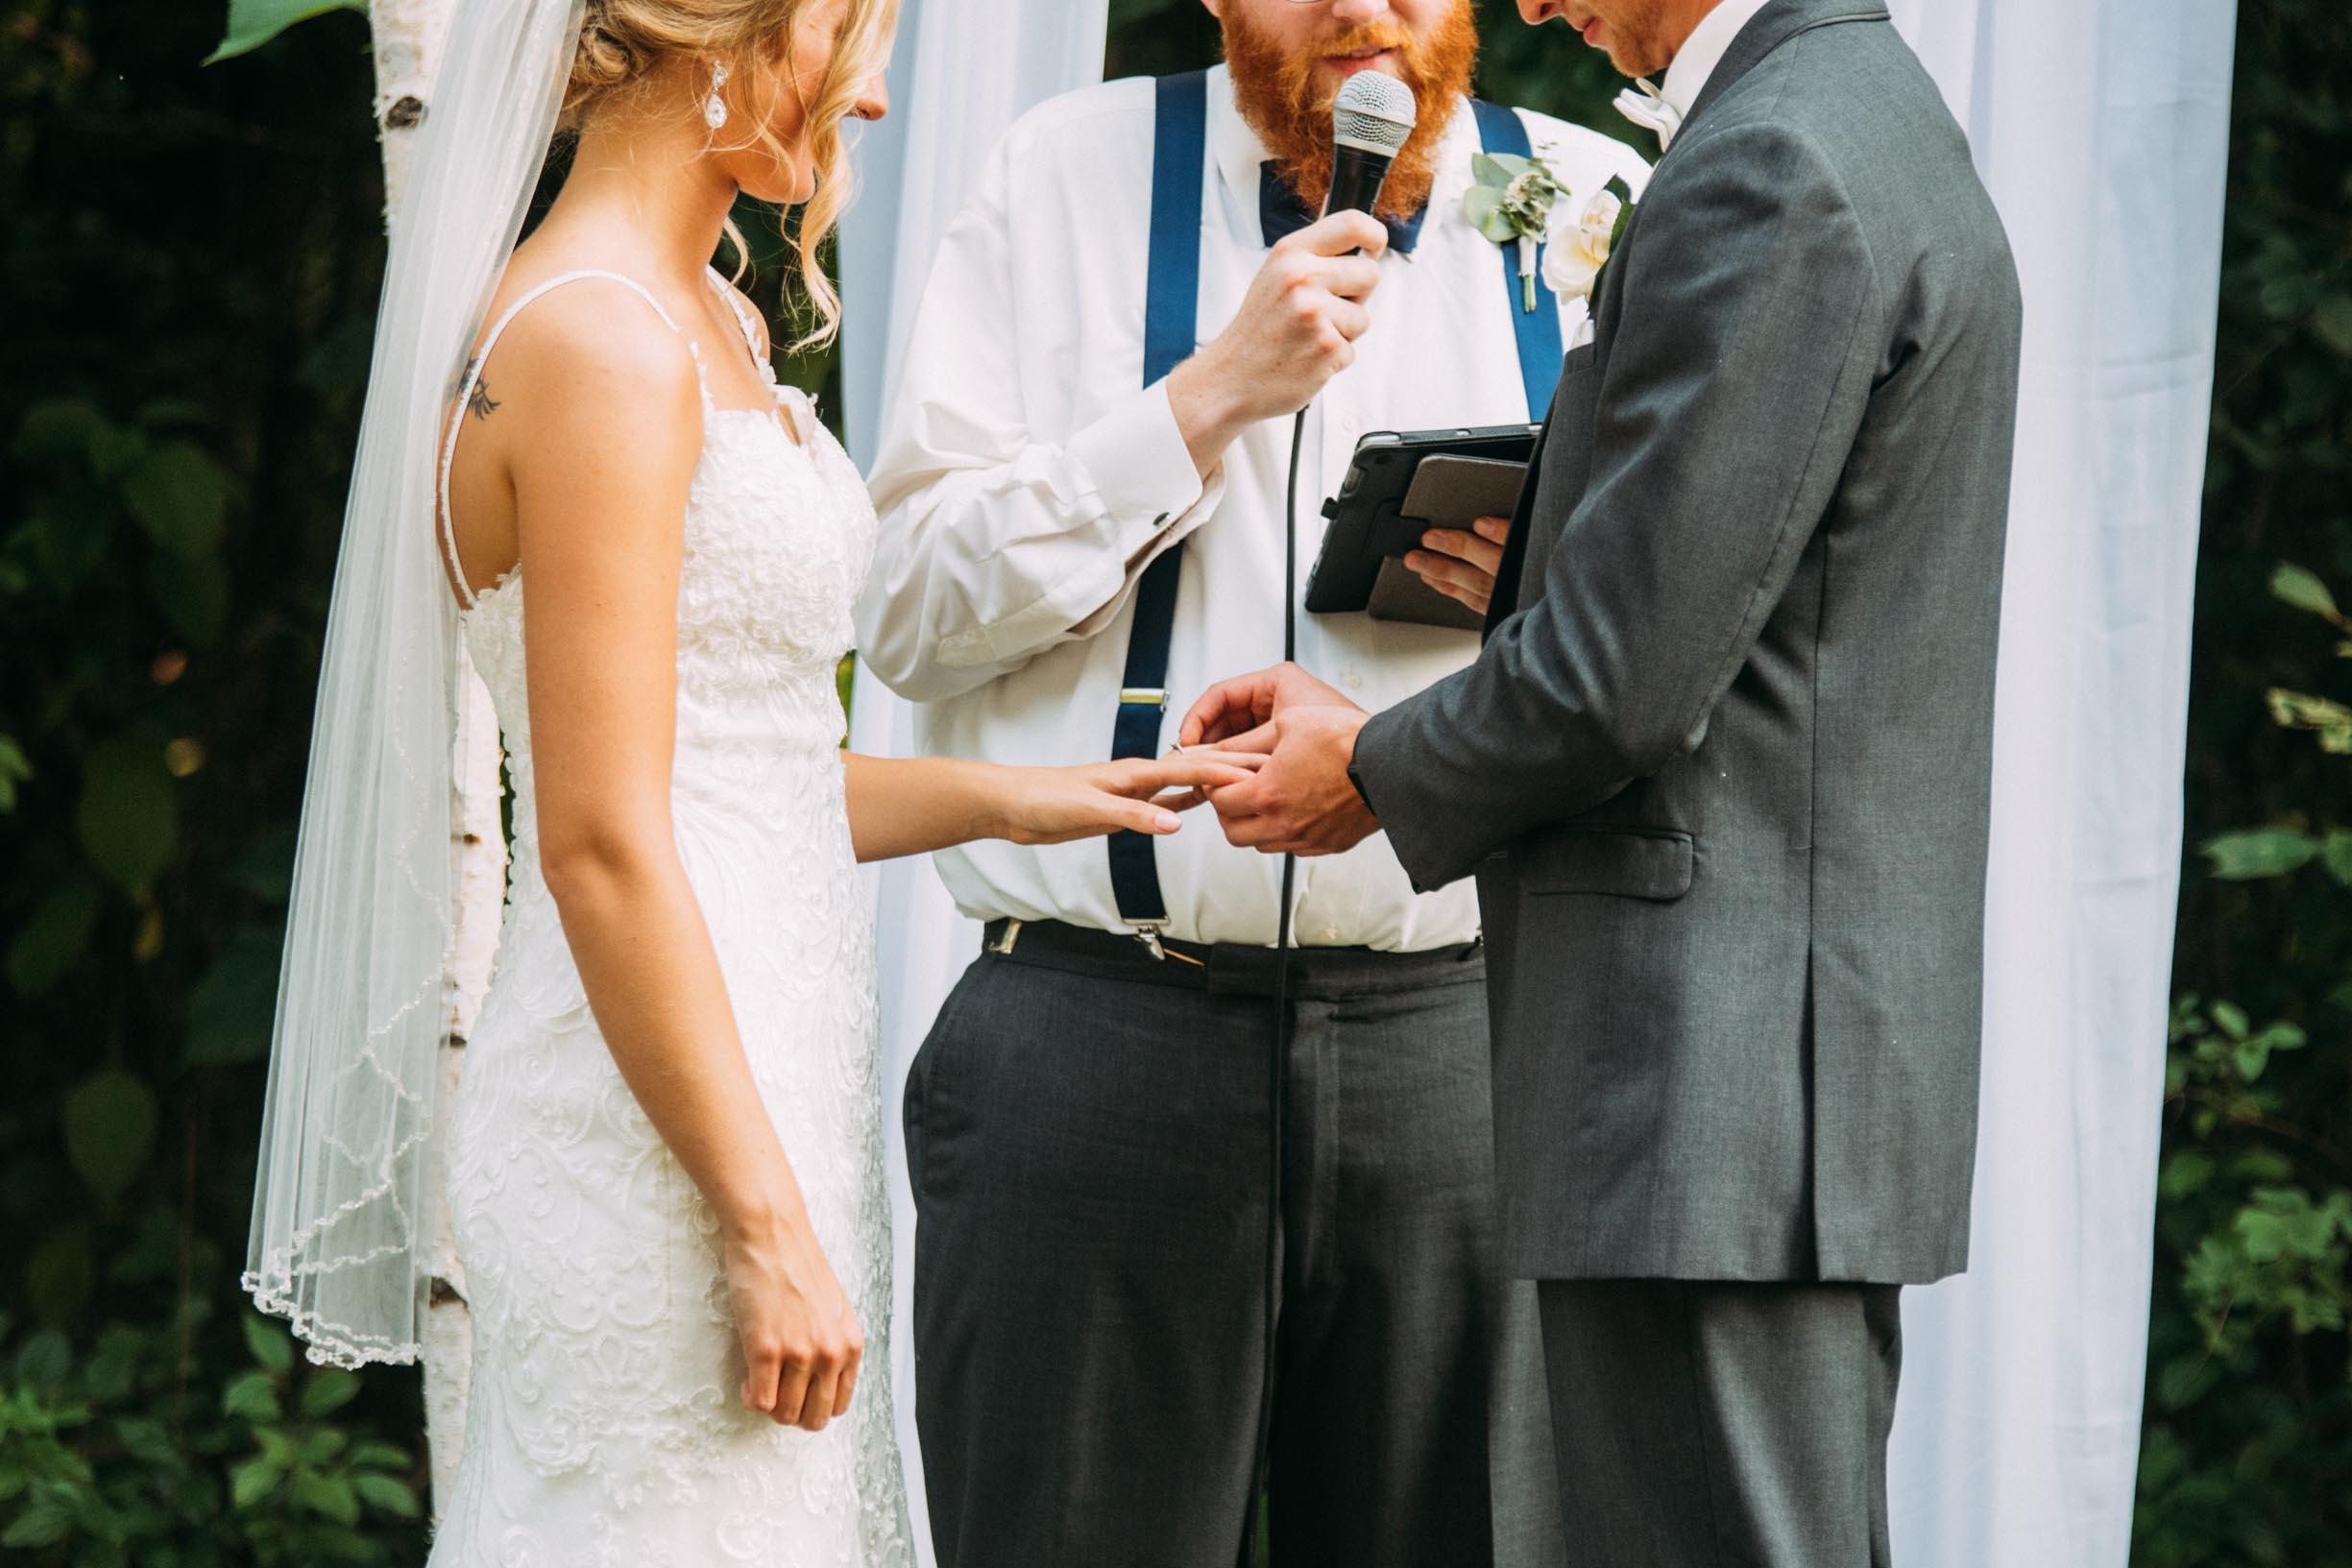 22-Minnetonka Orchards Wedding Ashley Bryce Blog.jpg